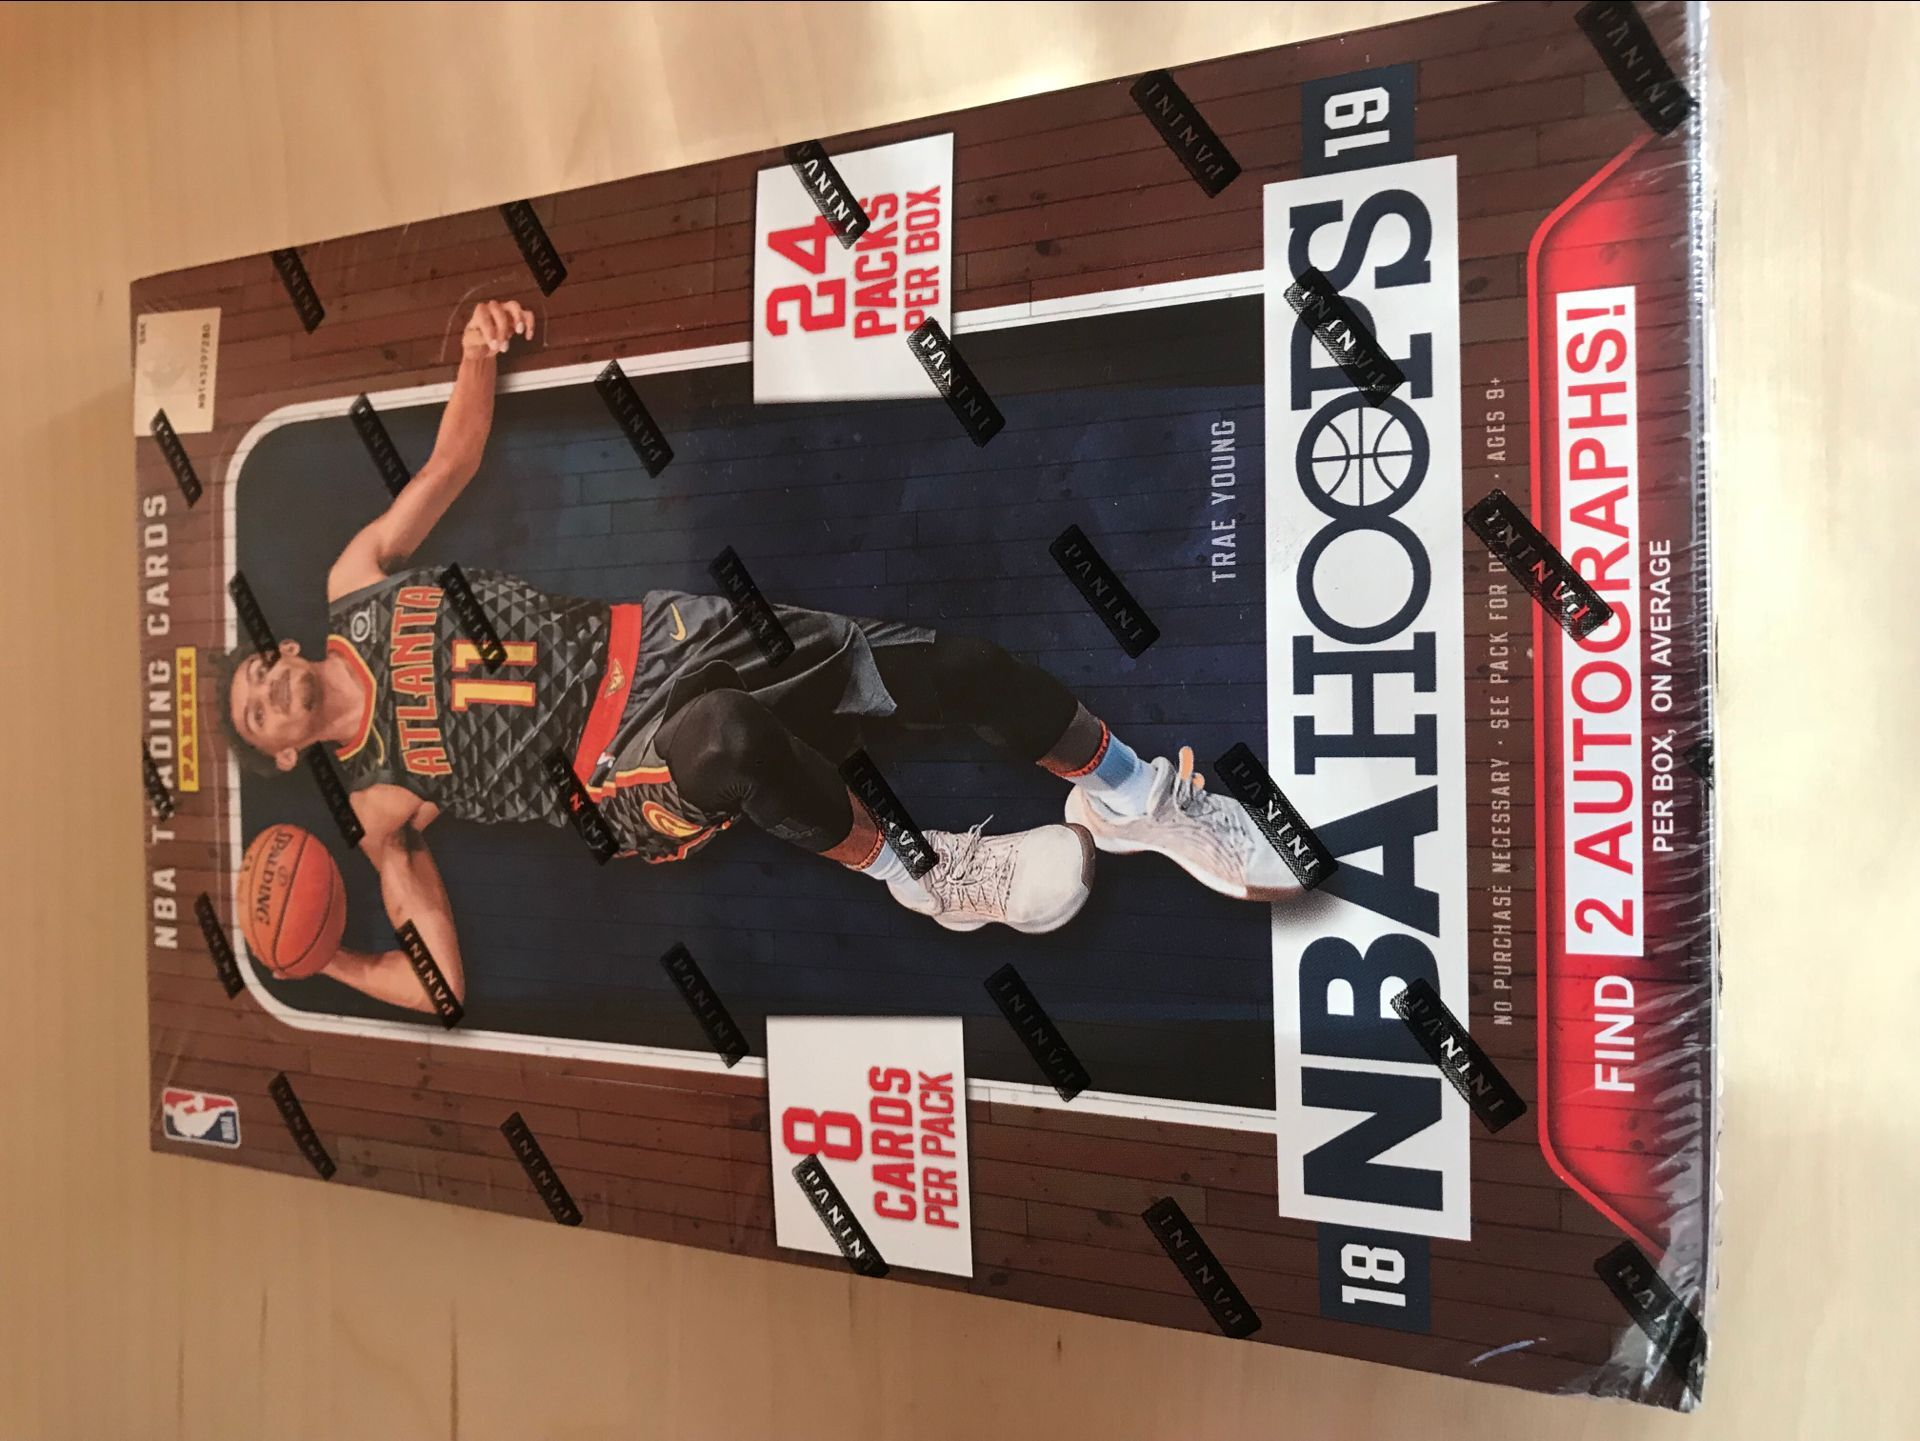 2018-2019 PANINI HOOP系列 原箱20合拍卖第16合尾号58,一盒2签字,艾顿、巴格利、东契奇、特雷杨等RC首款签字、低编、总冠军之路、1-1等